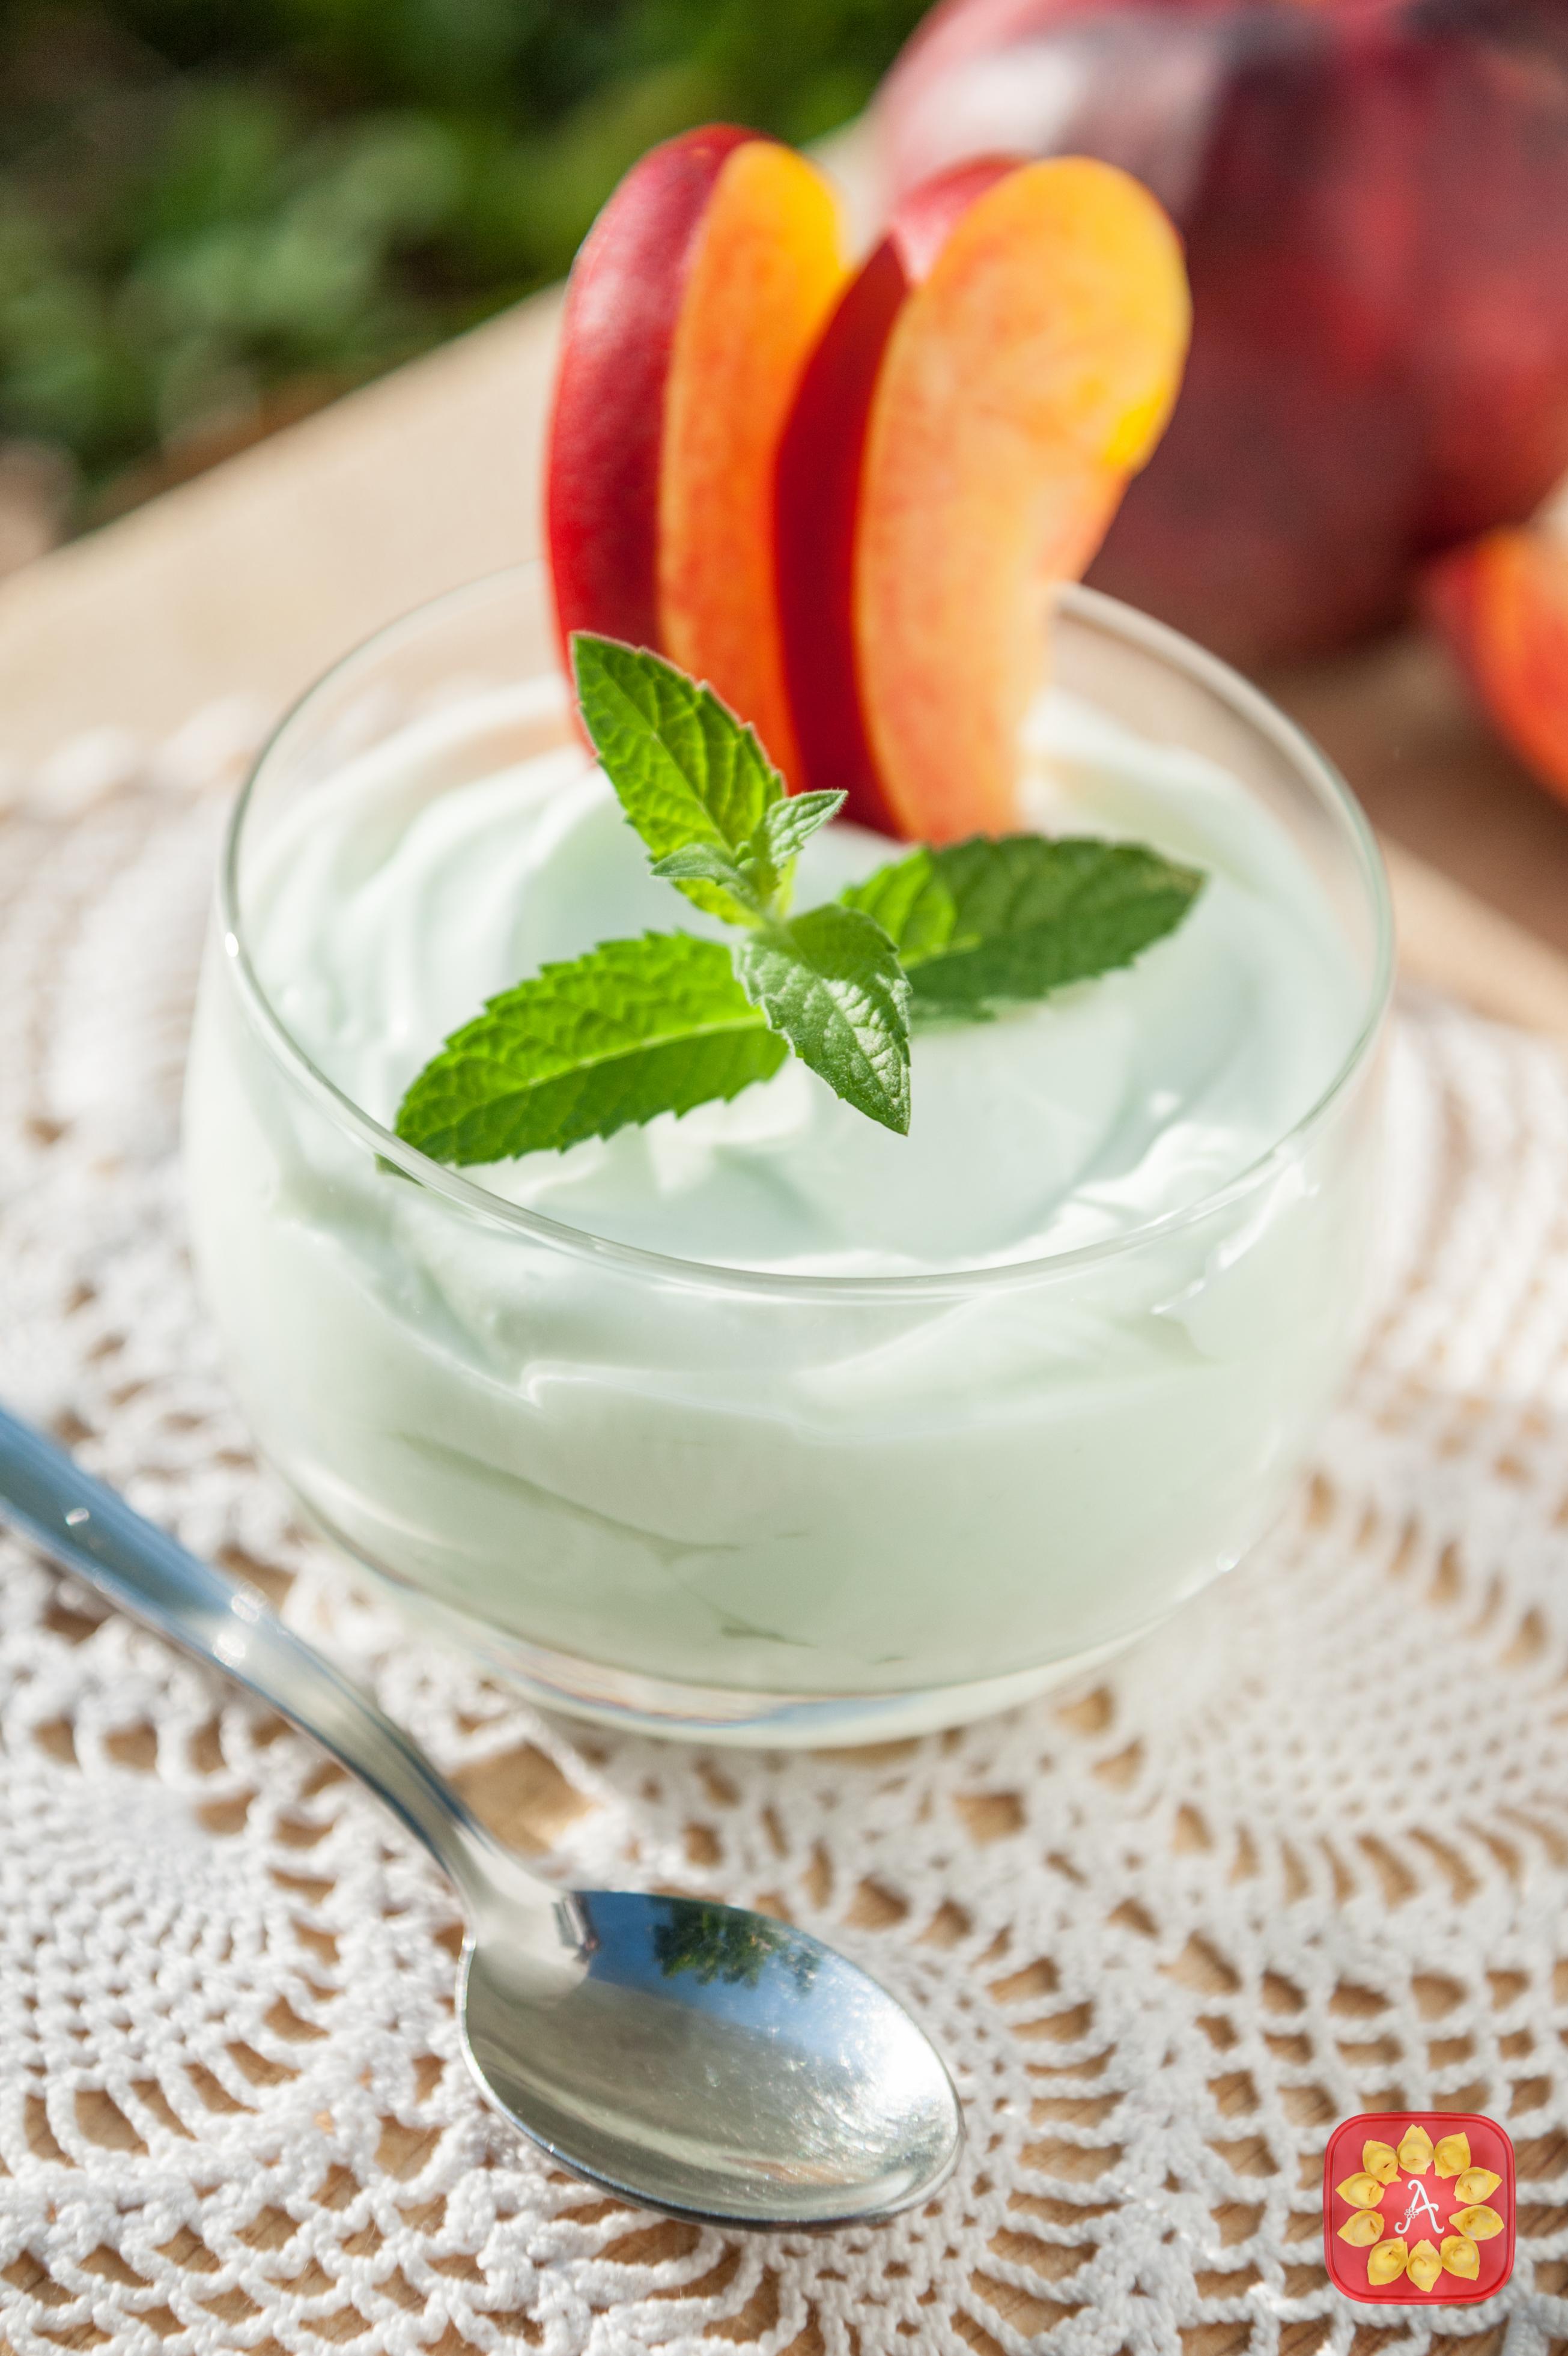 Mousse yogurt alla menta